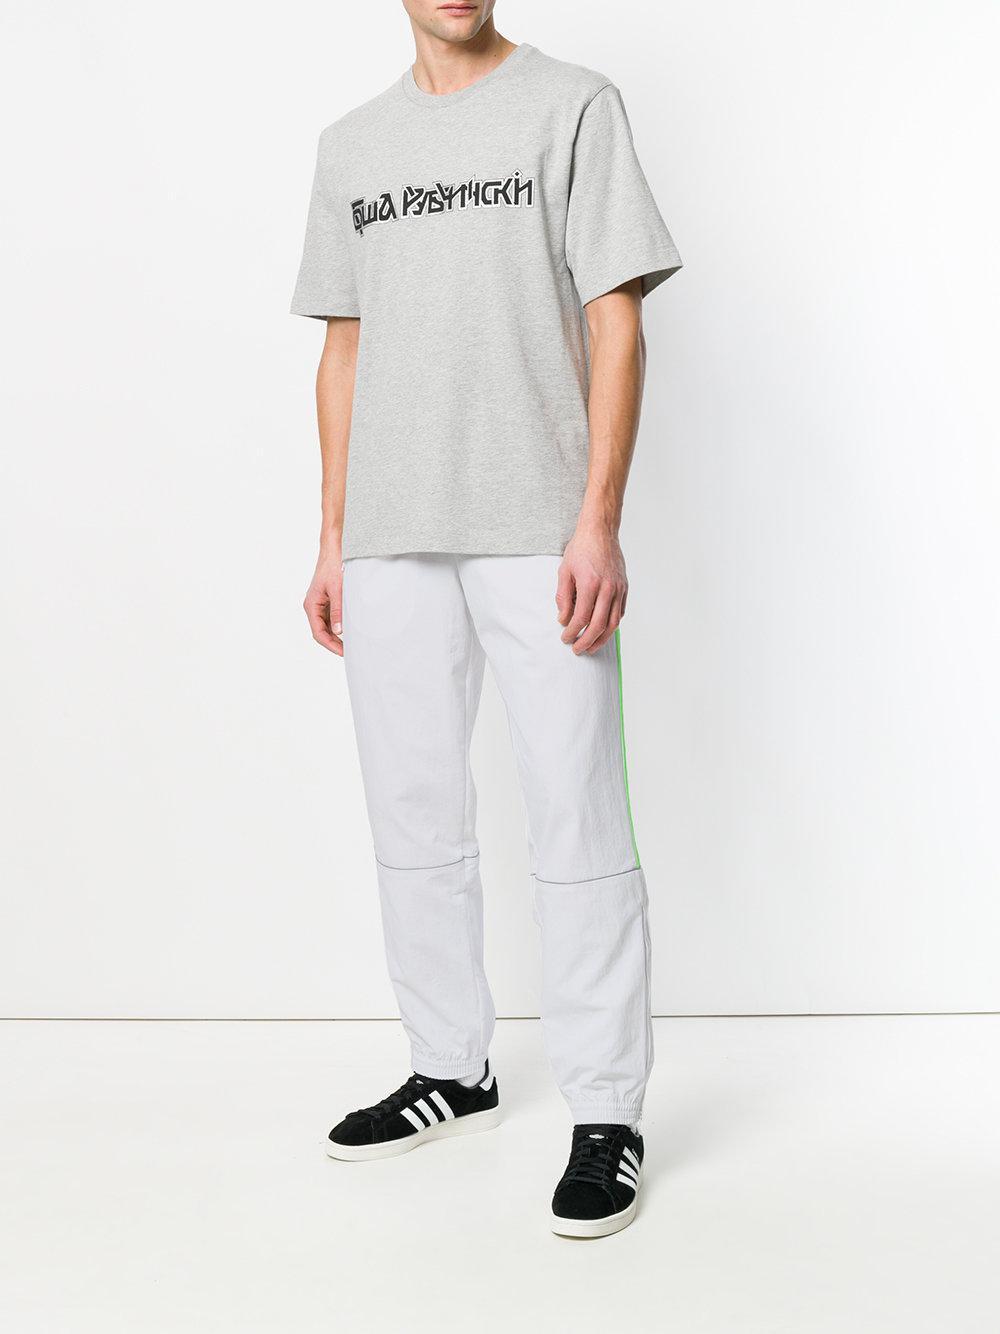 f2c1162a6822 Lyst - Gosha Rubchinskiy Gosha Rubchinskiy X Adidas Track Pants in White